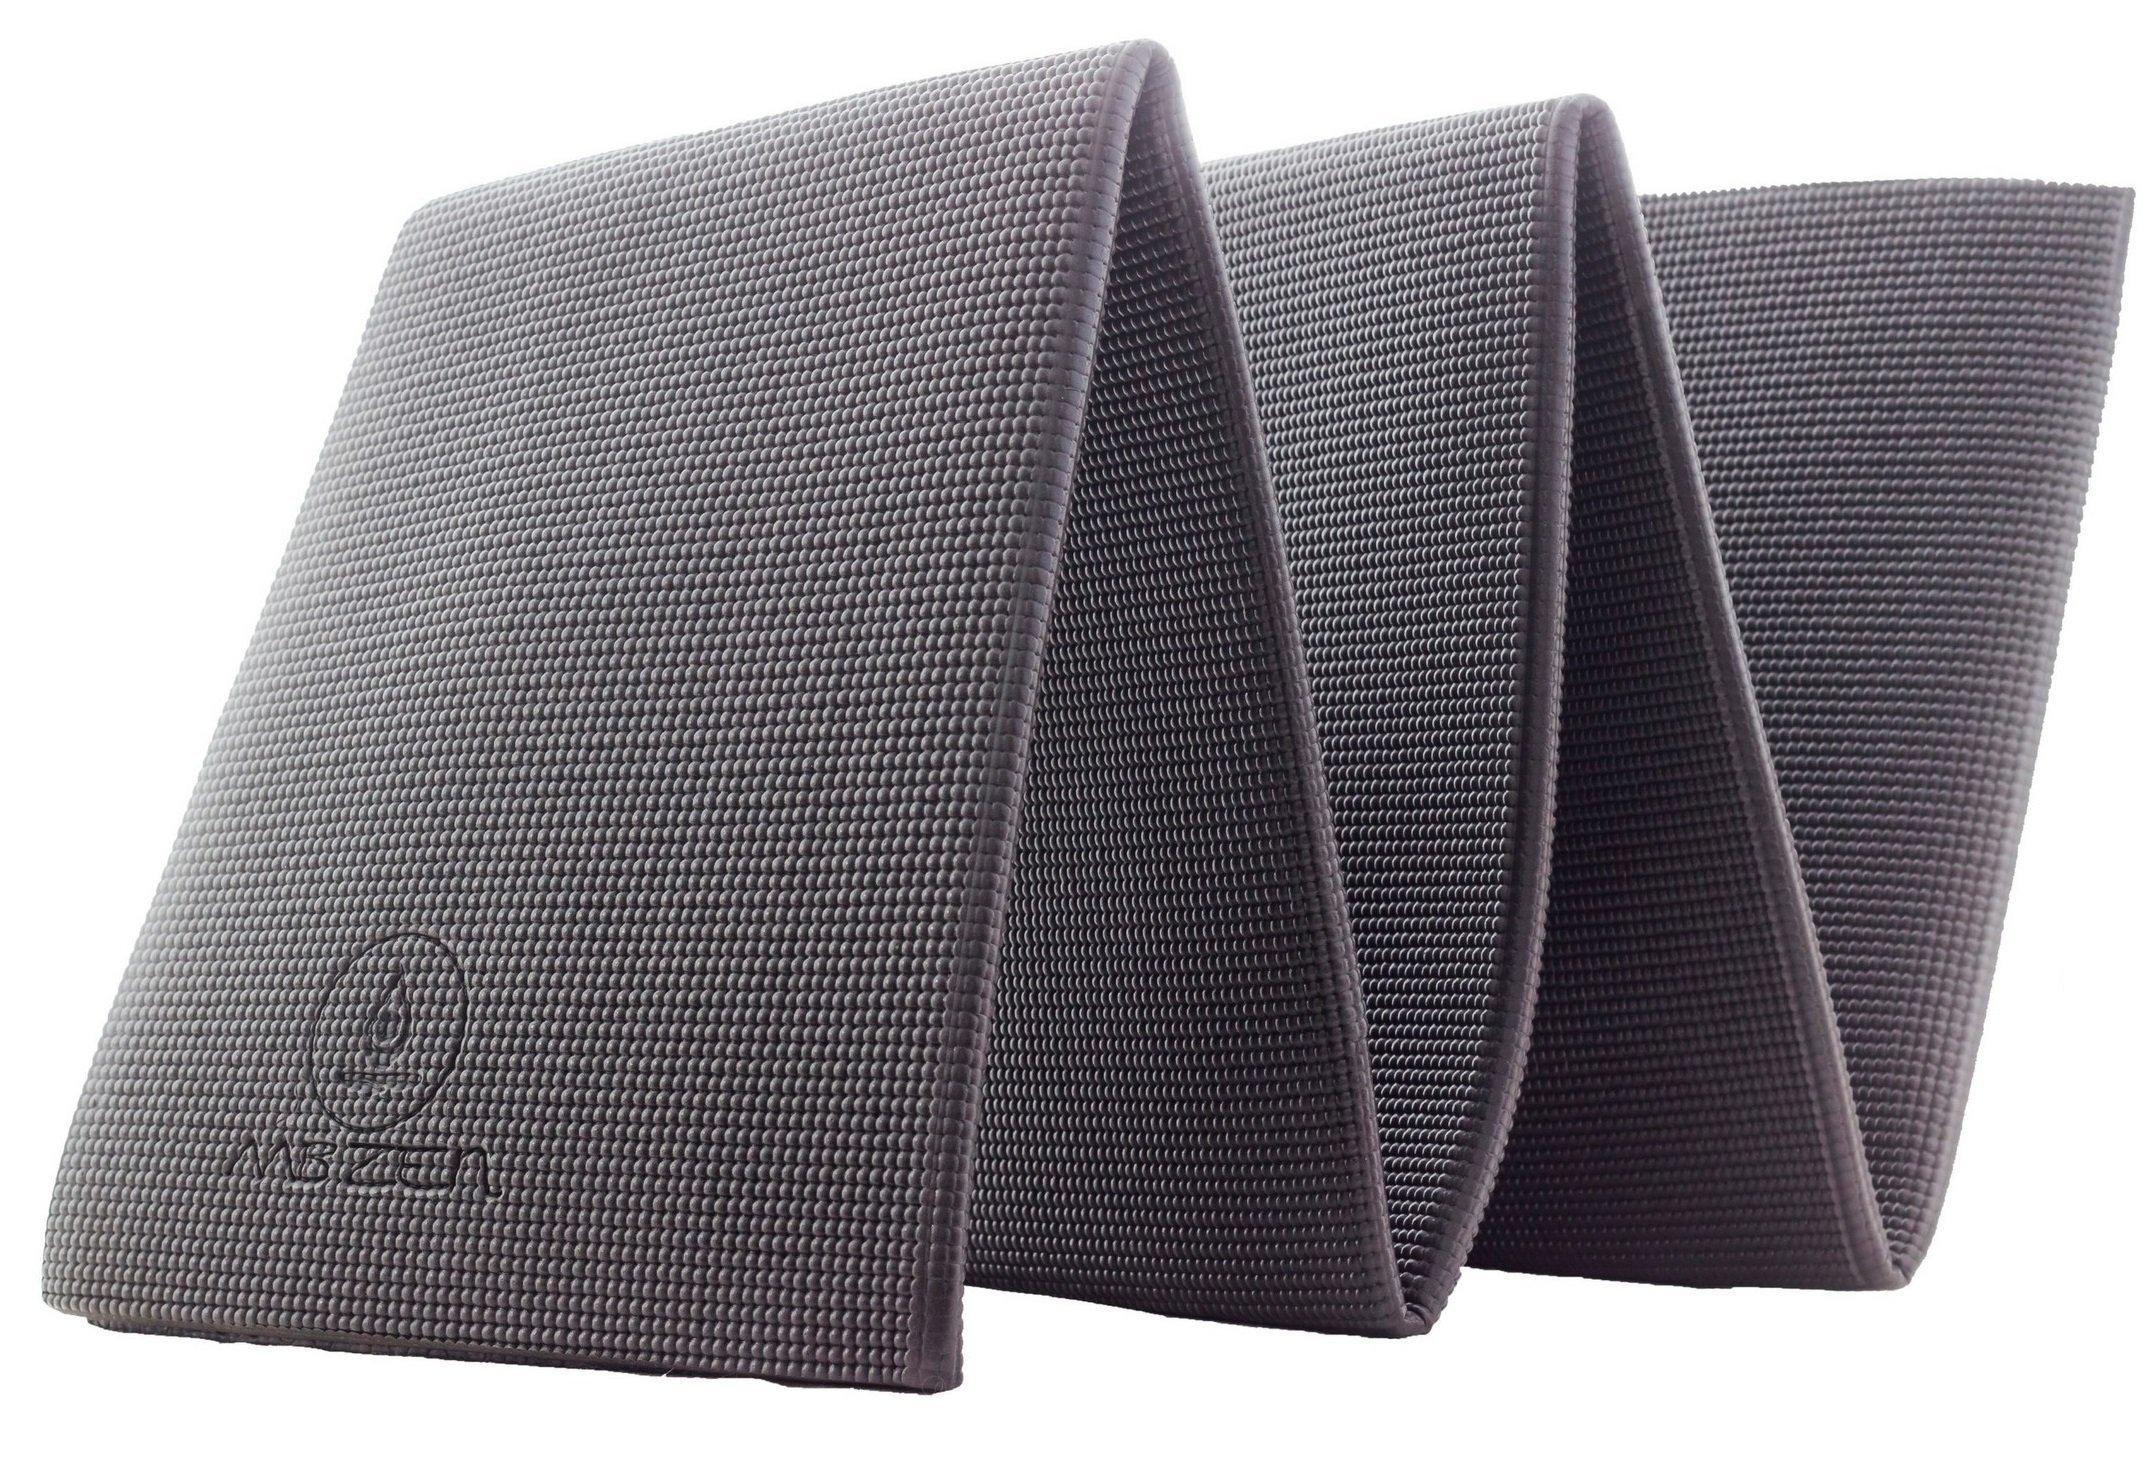 Esterilla Yoga Plegable y Antideslizante – Yoga Mat Perfecta para Yoga Fitness o Gimnasia – Gruesa